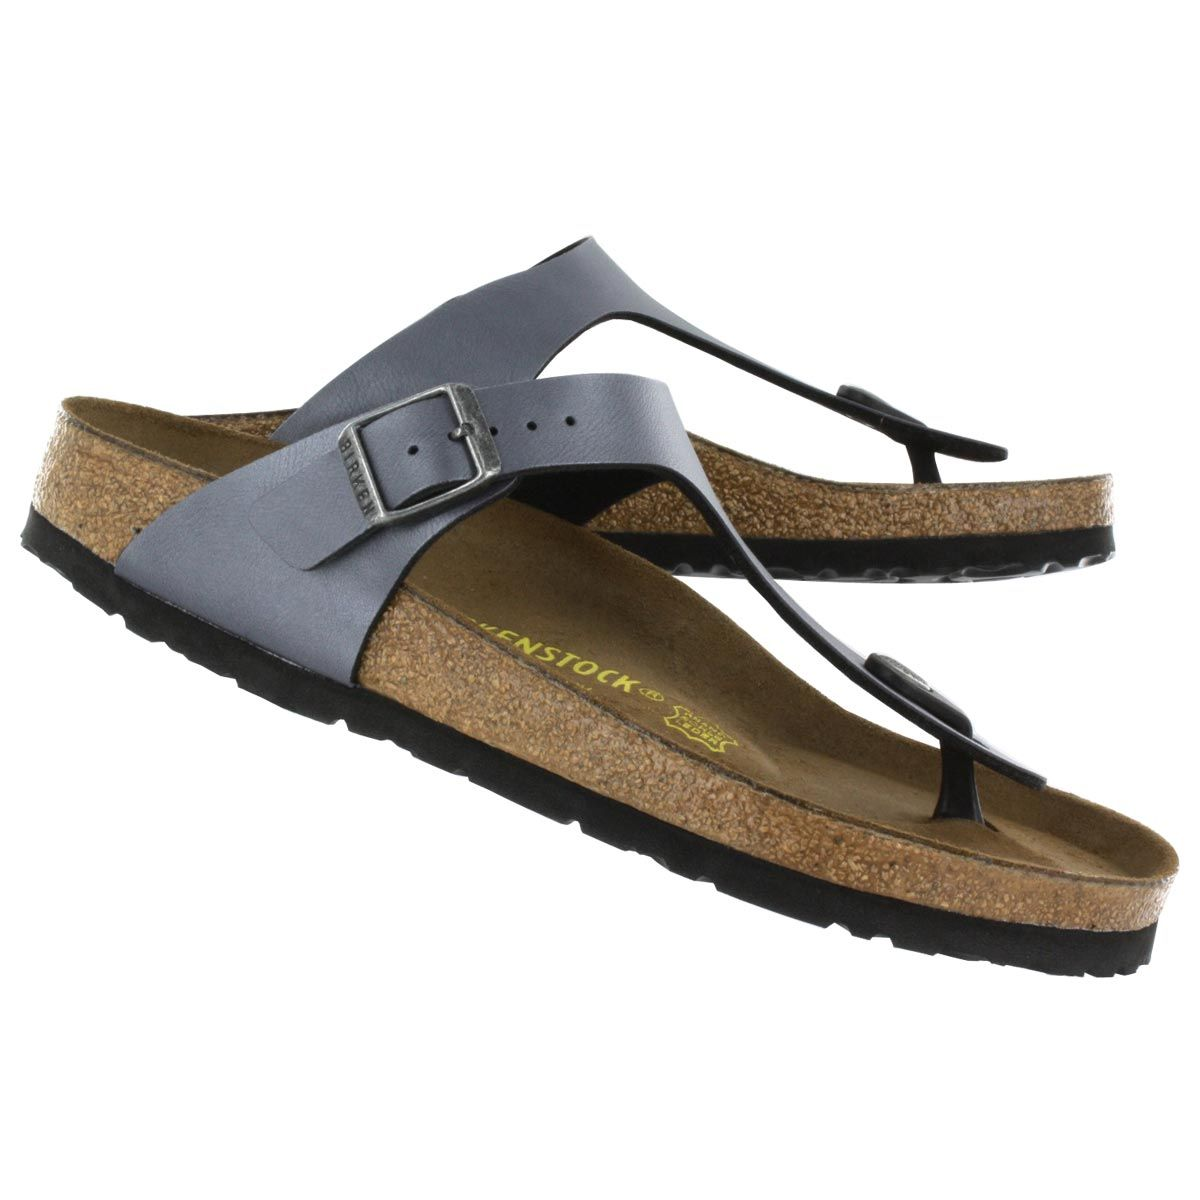 c5aab656e035 Birkenstock Women s GIZEH onyx ice thong sandals 843801